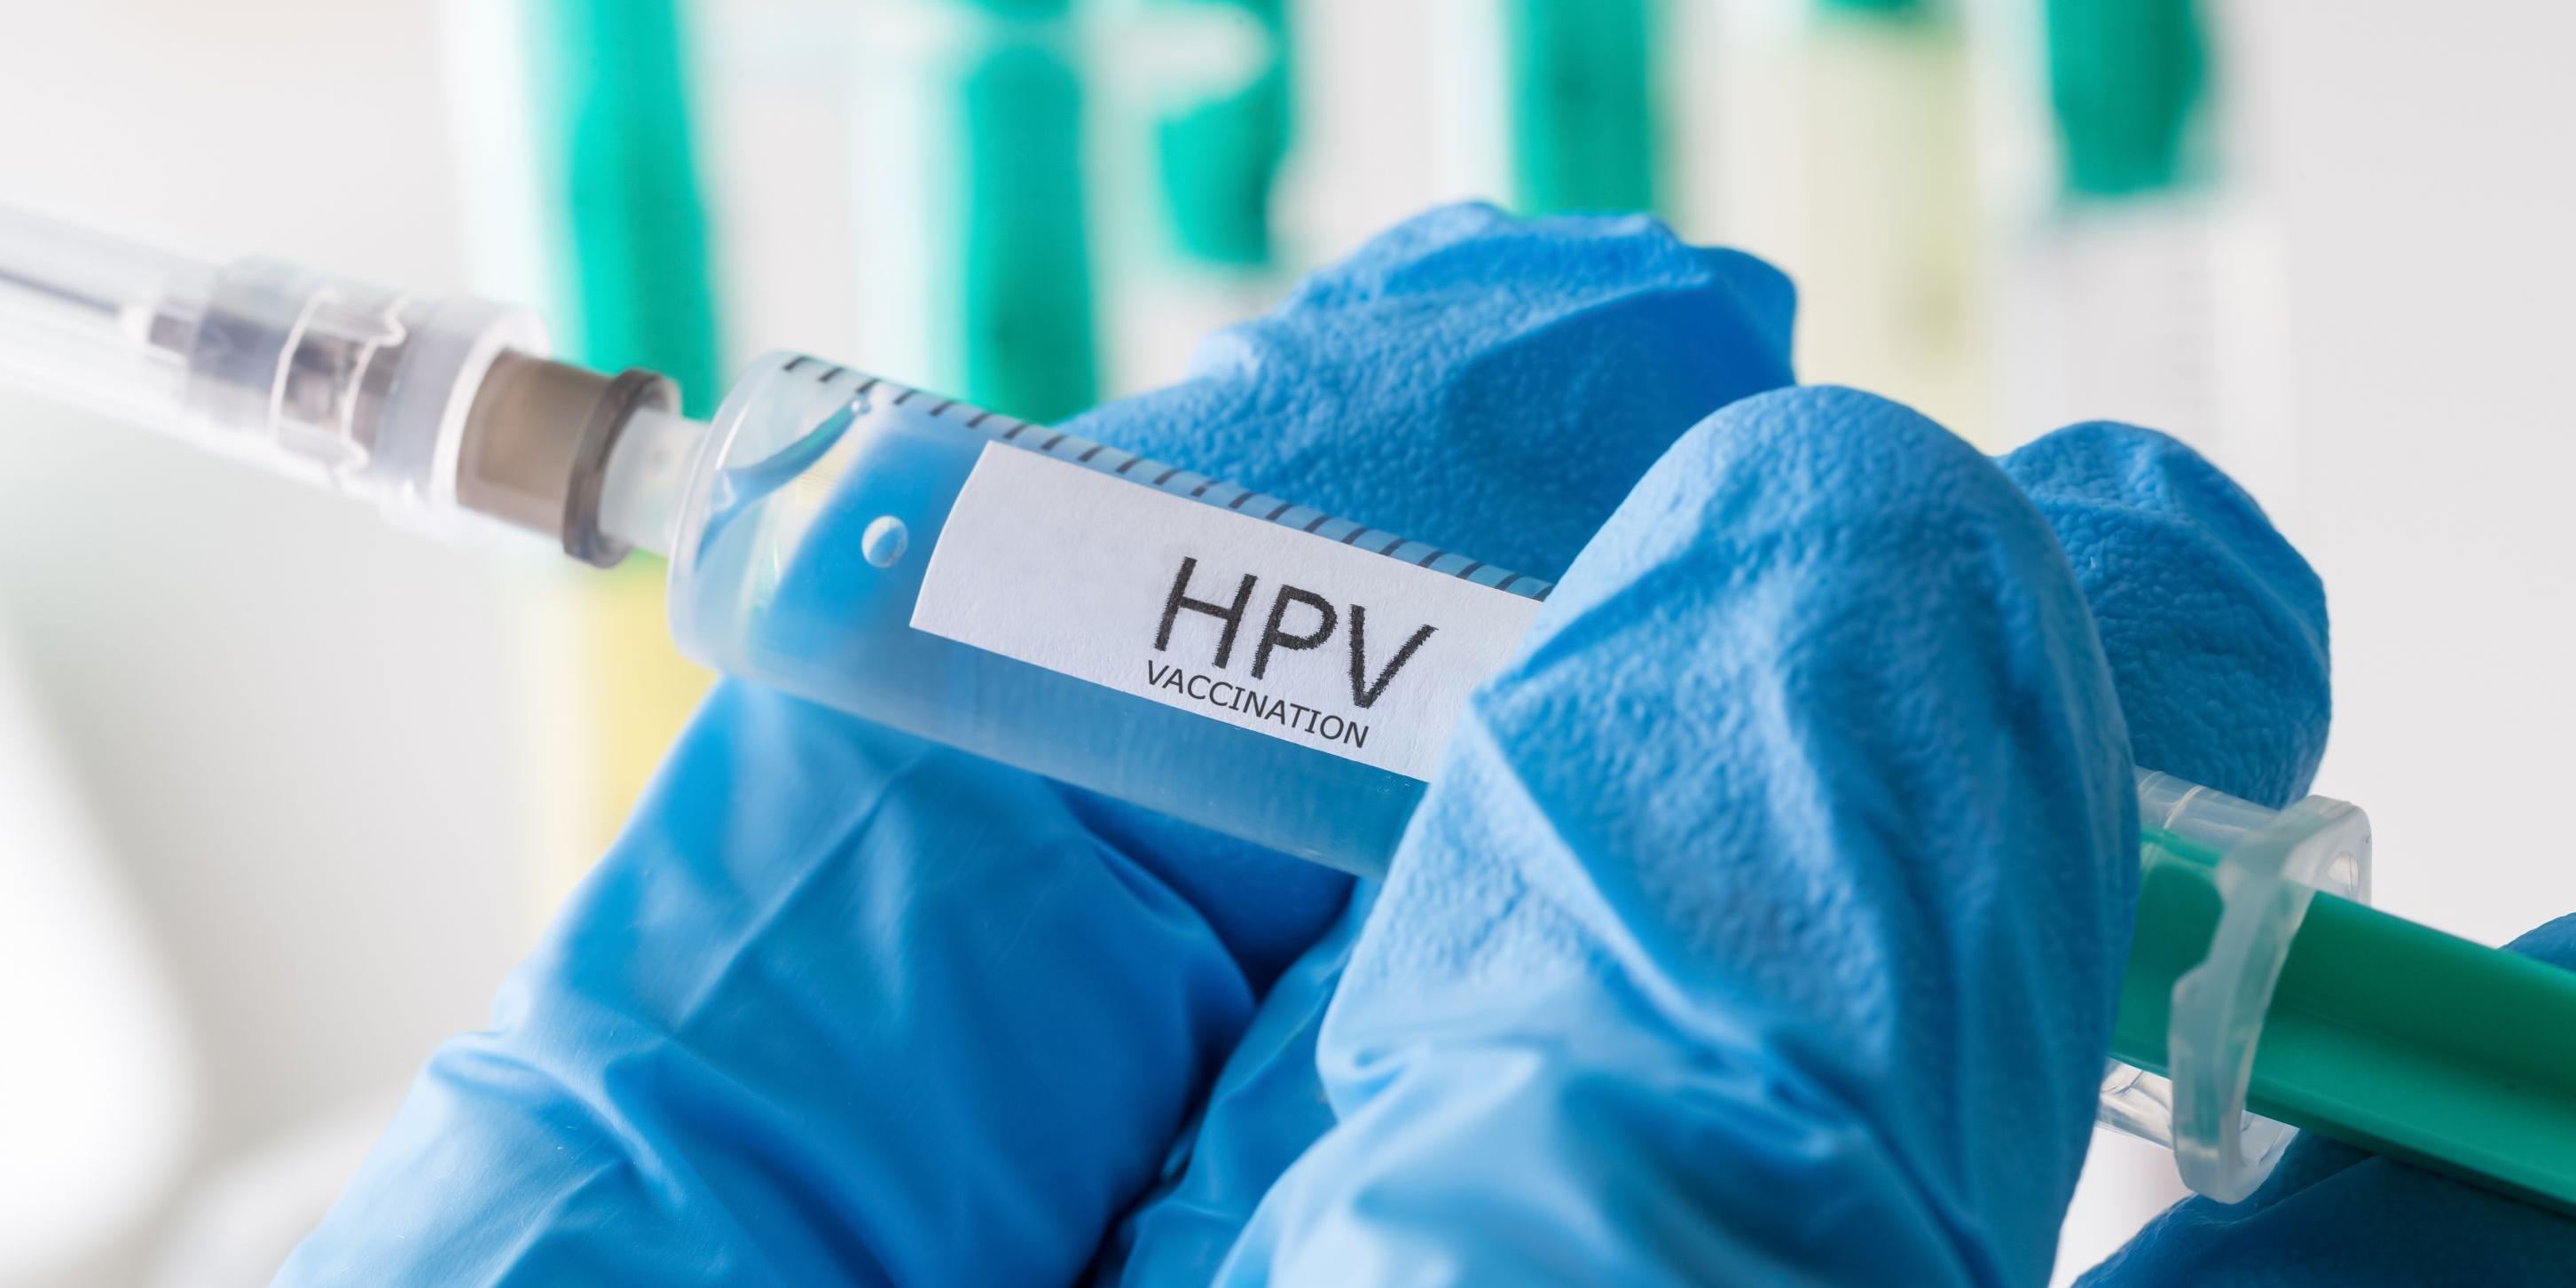 vaccin hpv sage femme human papillomavirus anogenital warts